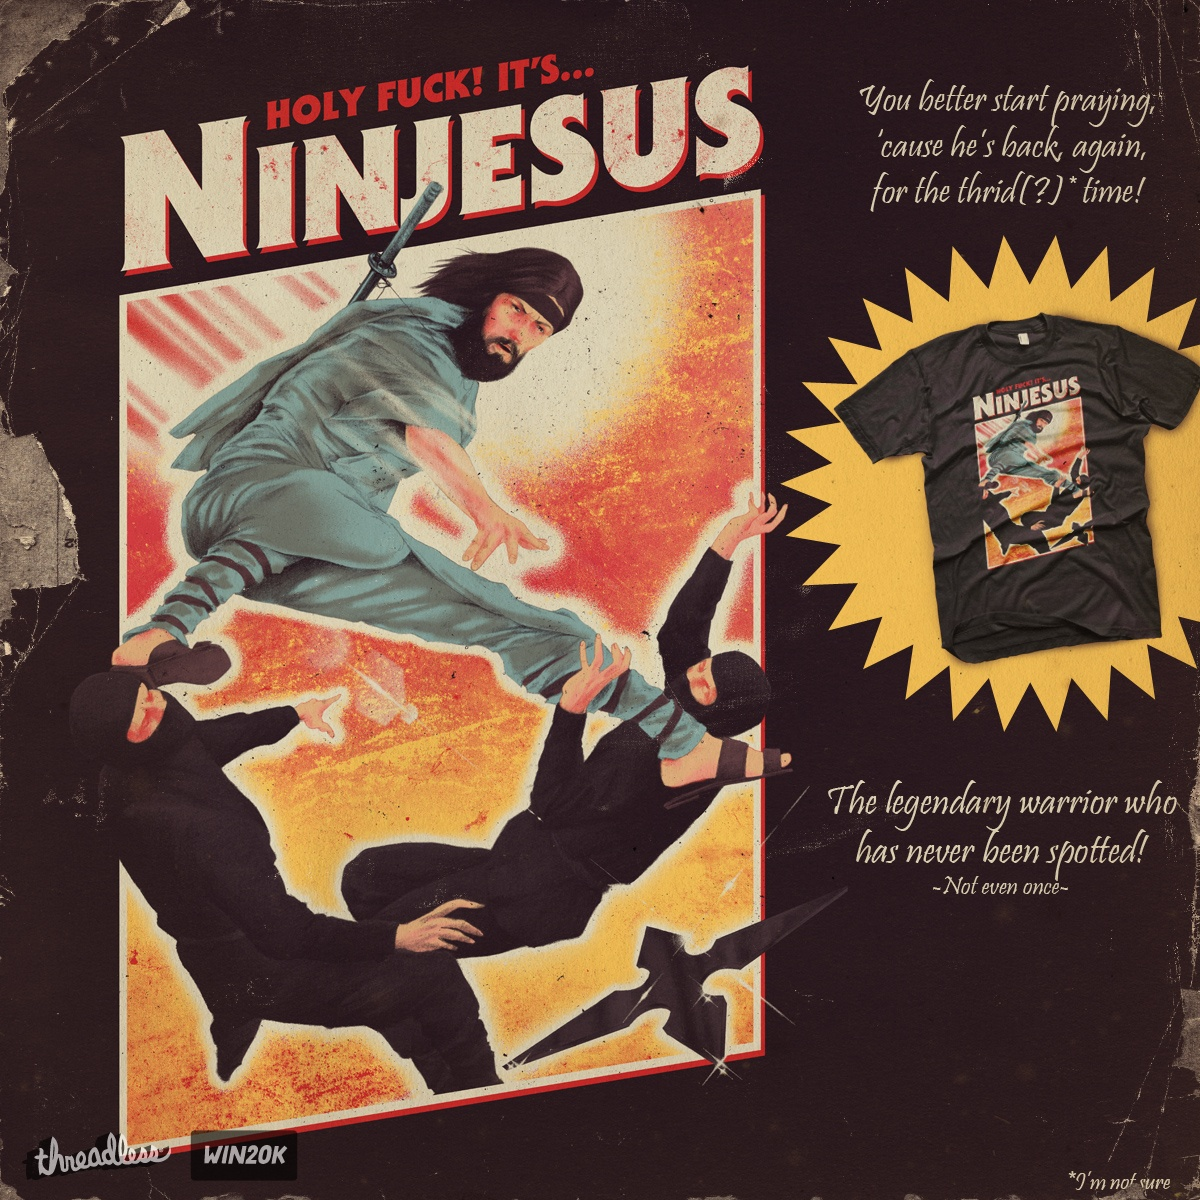 Ninjesus by mathiole and hafaell on Threadless